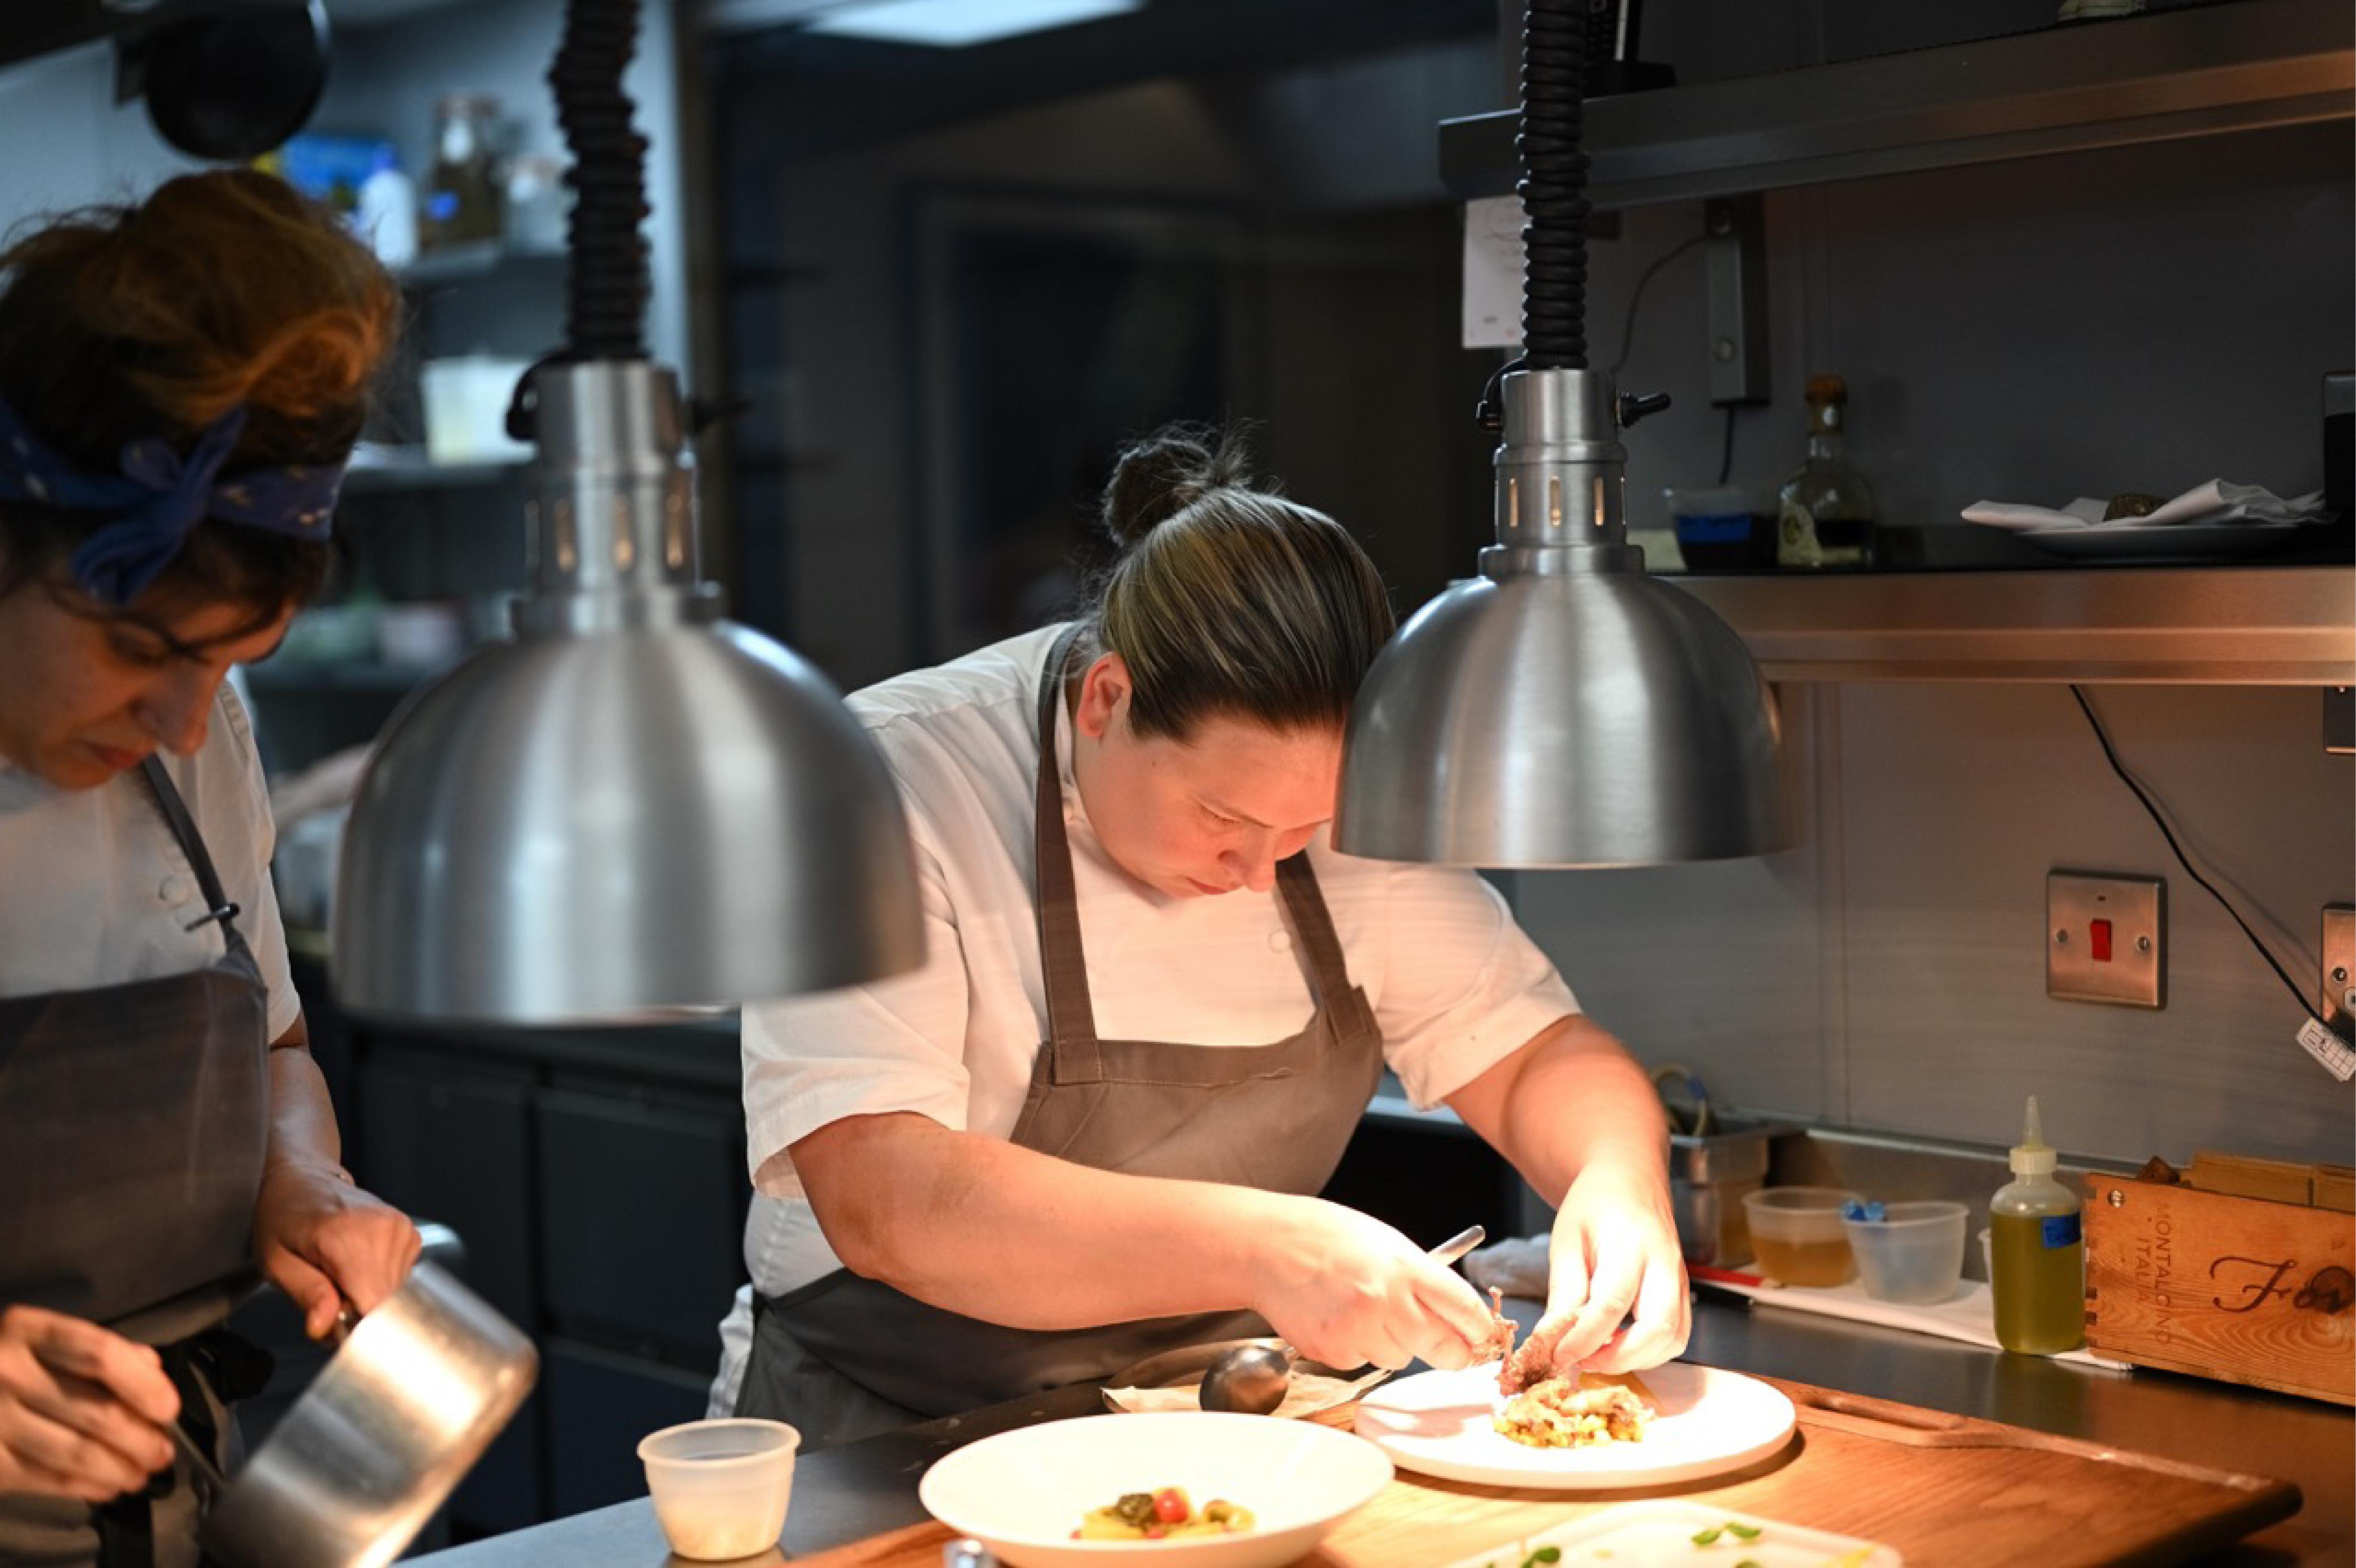 Brightman brings finesse to rustic Italian cuisine at Murano